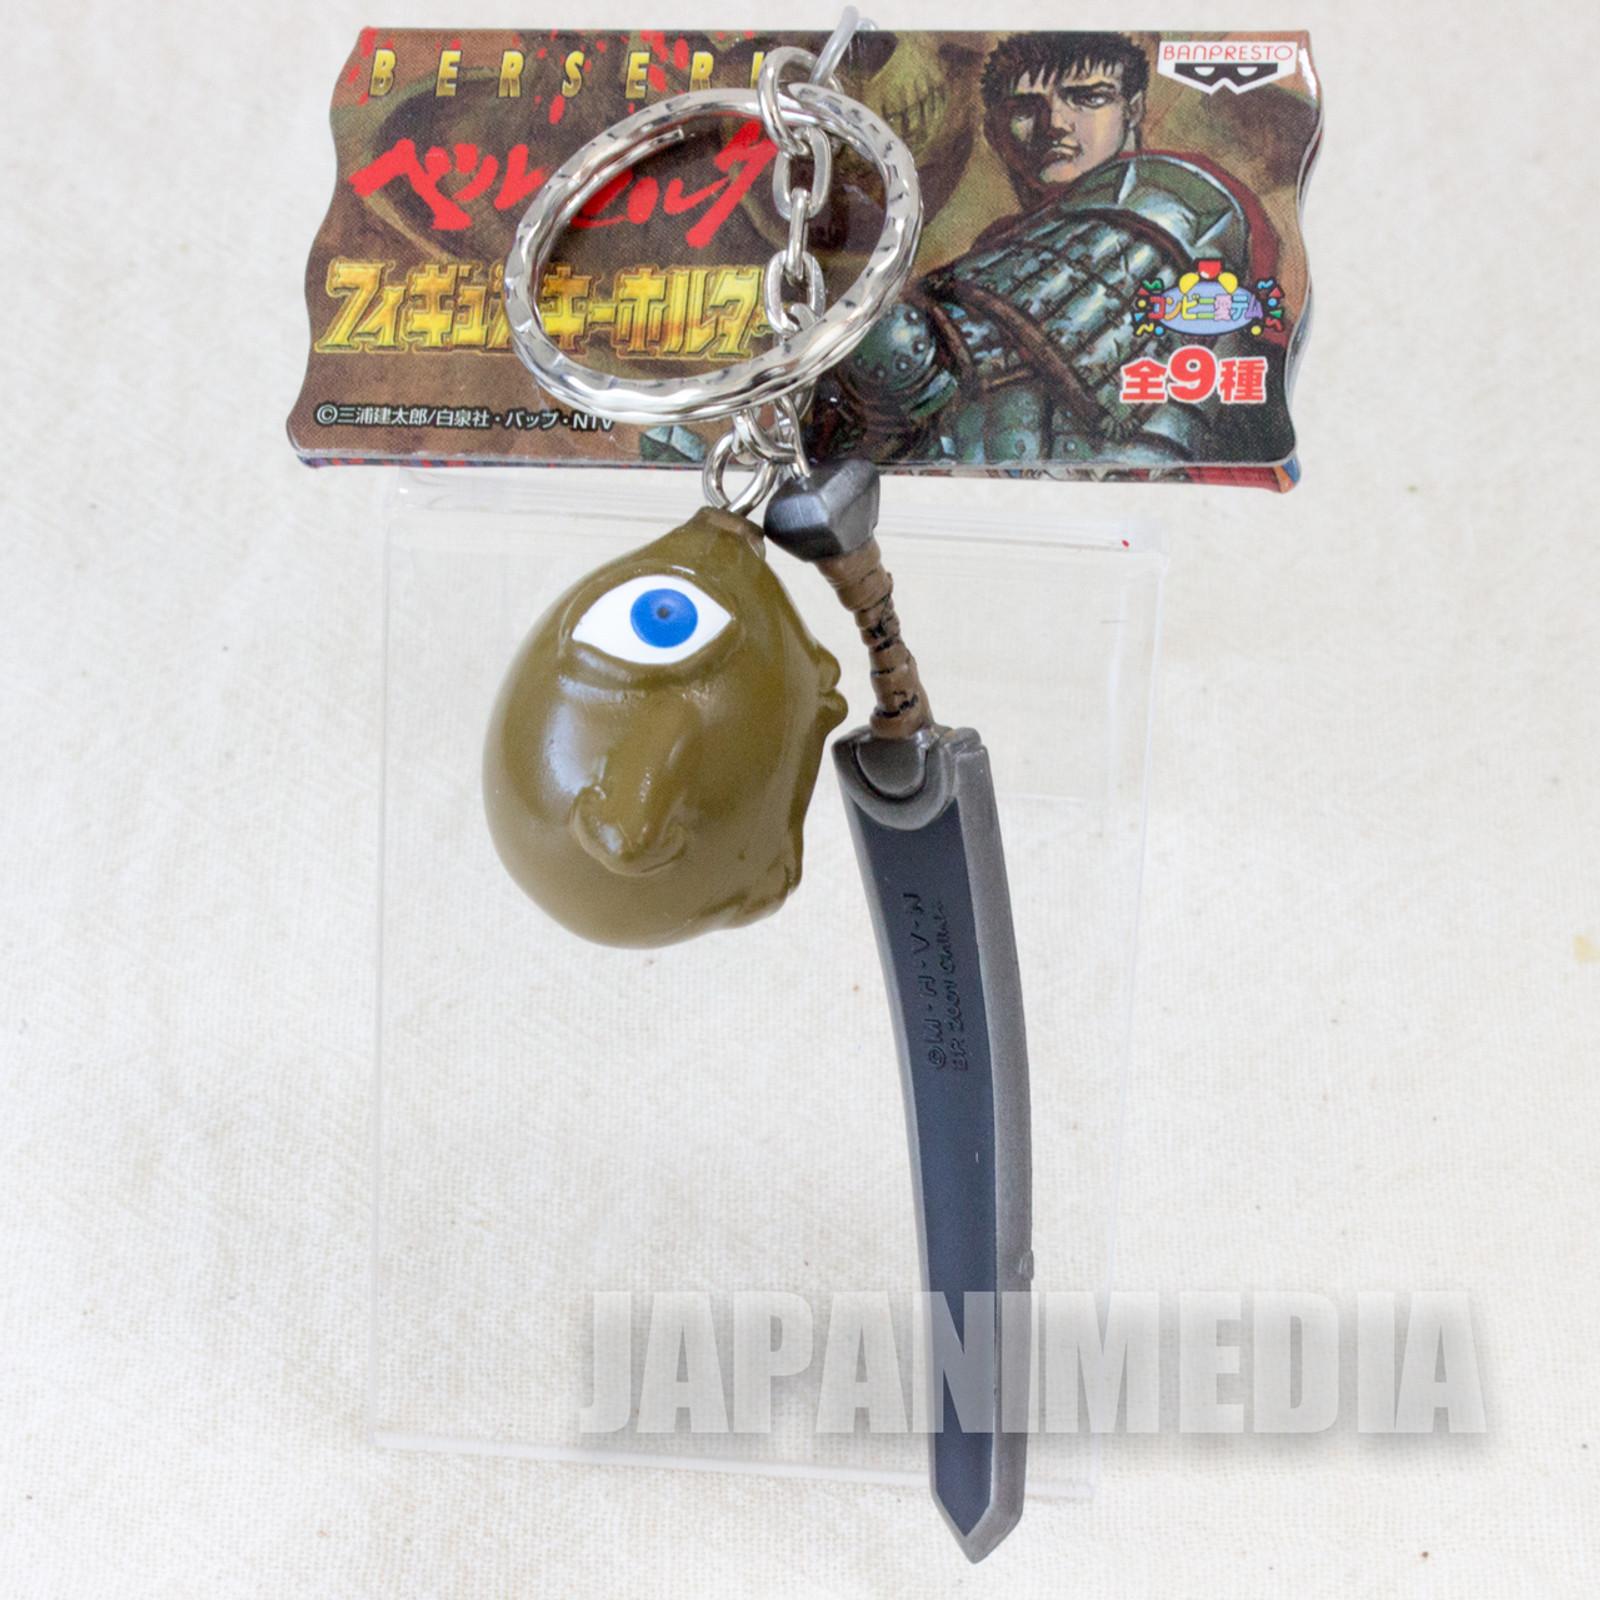 Berserk Brown Beherit & Guts Sword Mini Figure Key Chain Banpresto JAPAN ANIME